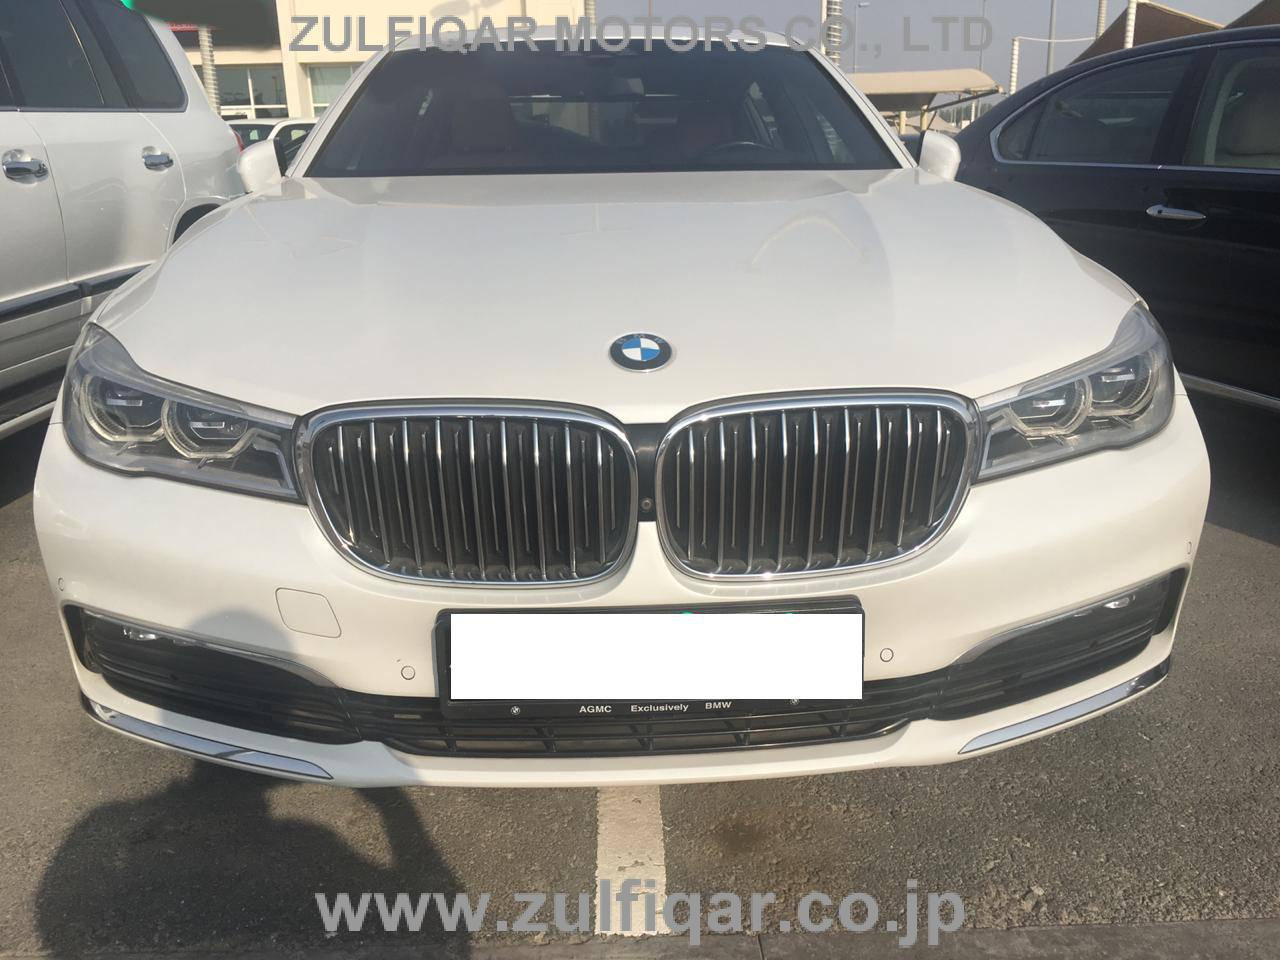 BMW 7 SERIES 2017 Image 1